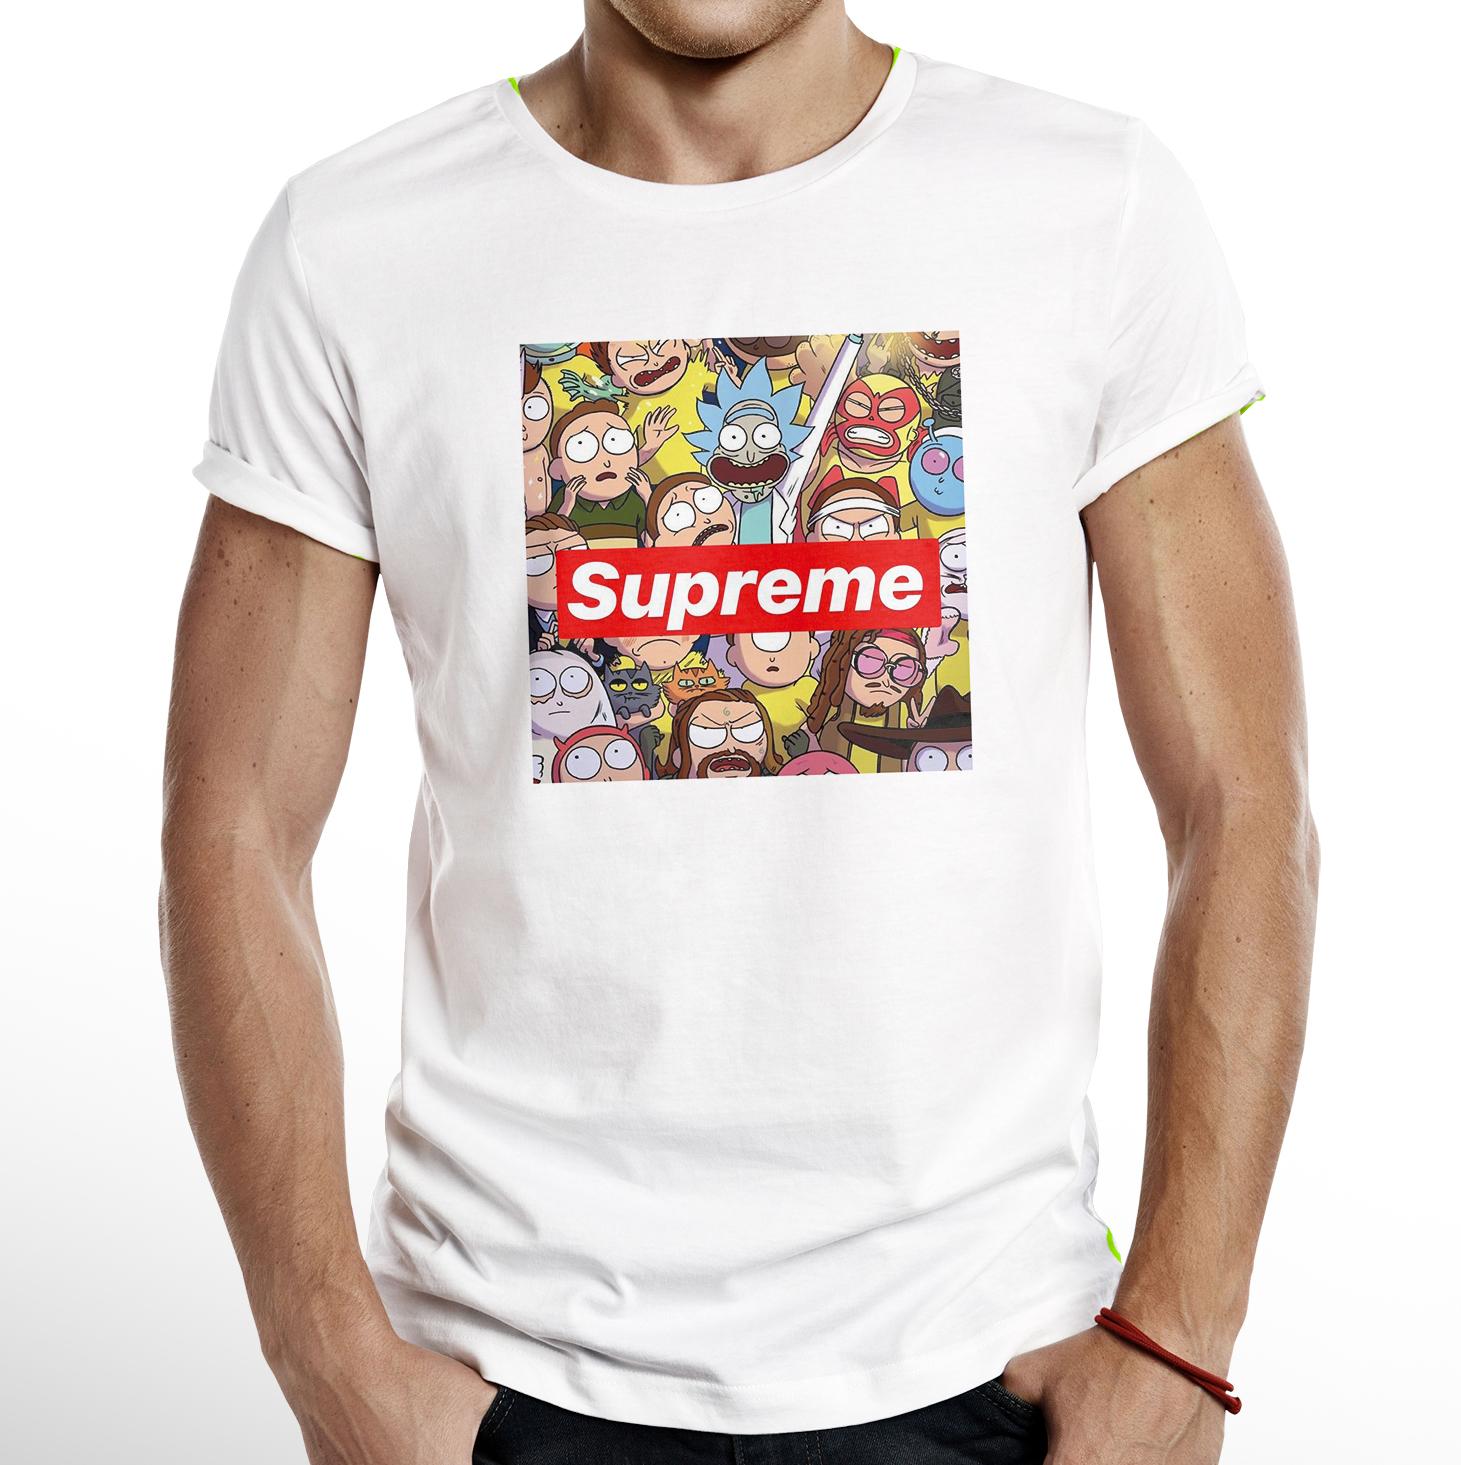 RickaMorty Luxury Brand T-shirt